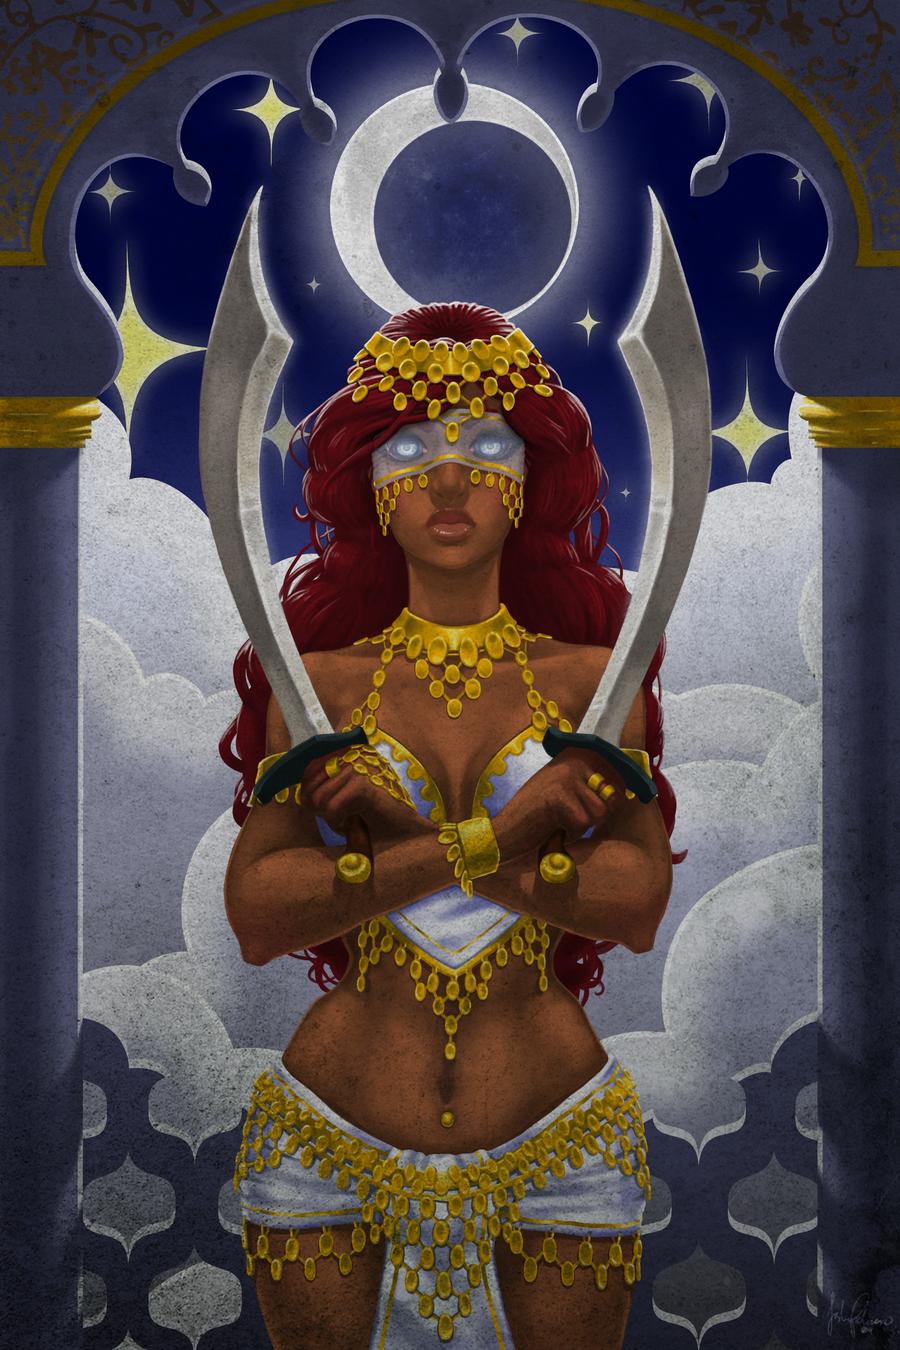 Serafín: Ainieye Banu-Razin, la luz del desierto Two_of_Swords___Arabian_Nights_by_00chalcedony00